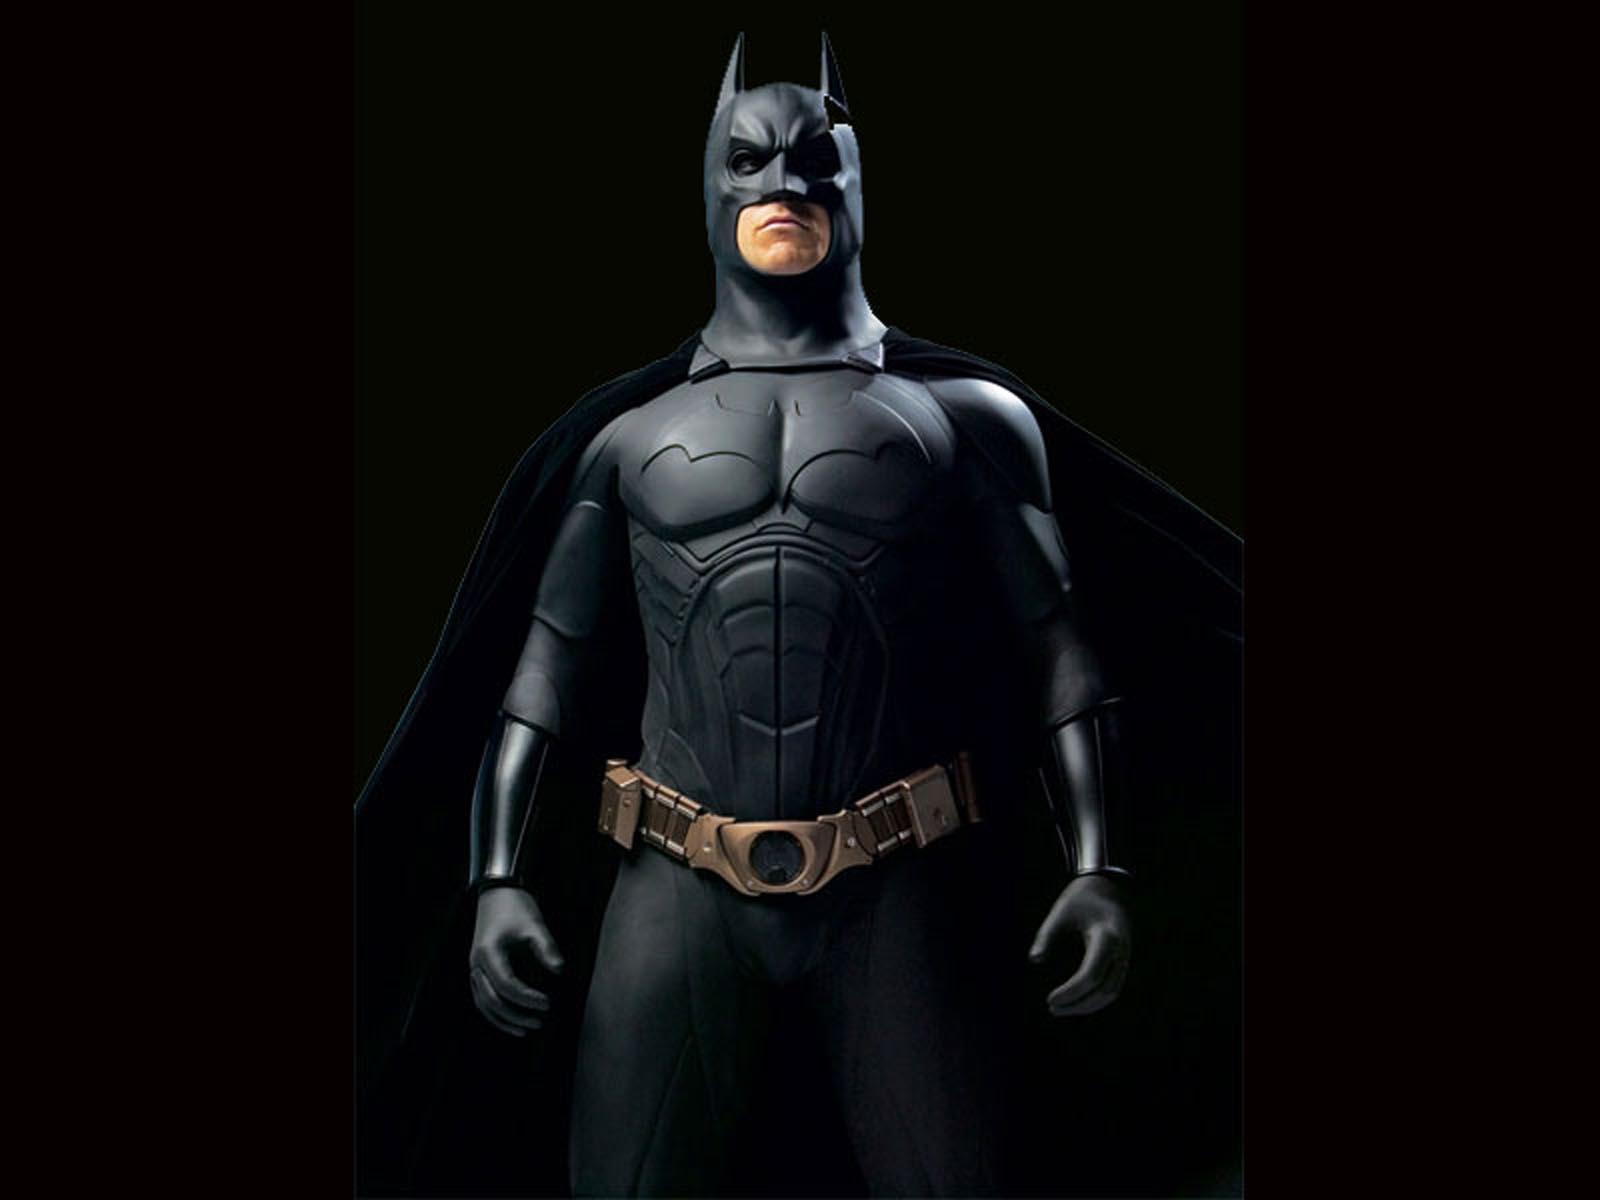 batman 3d wallpaper - wallpapersafari